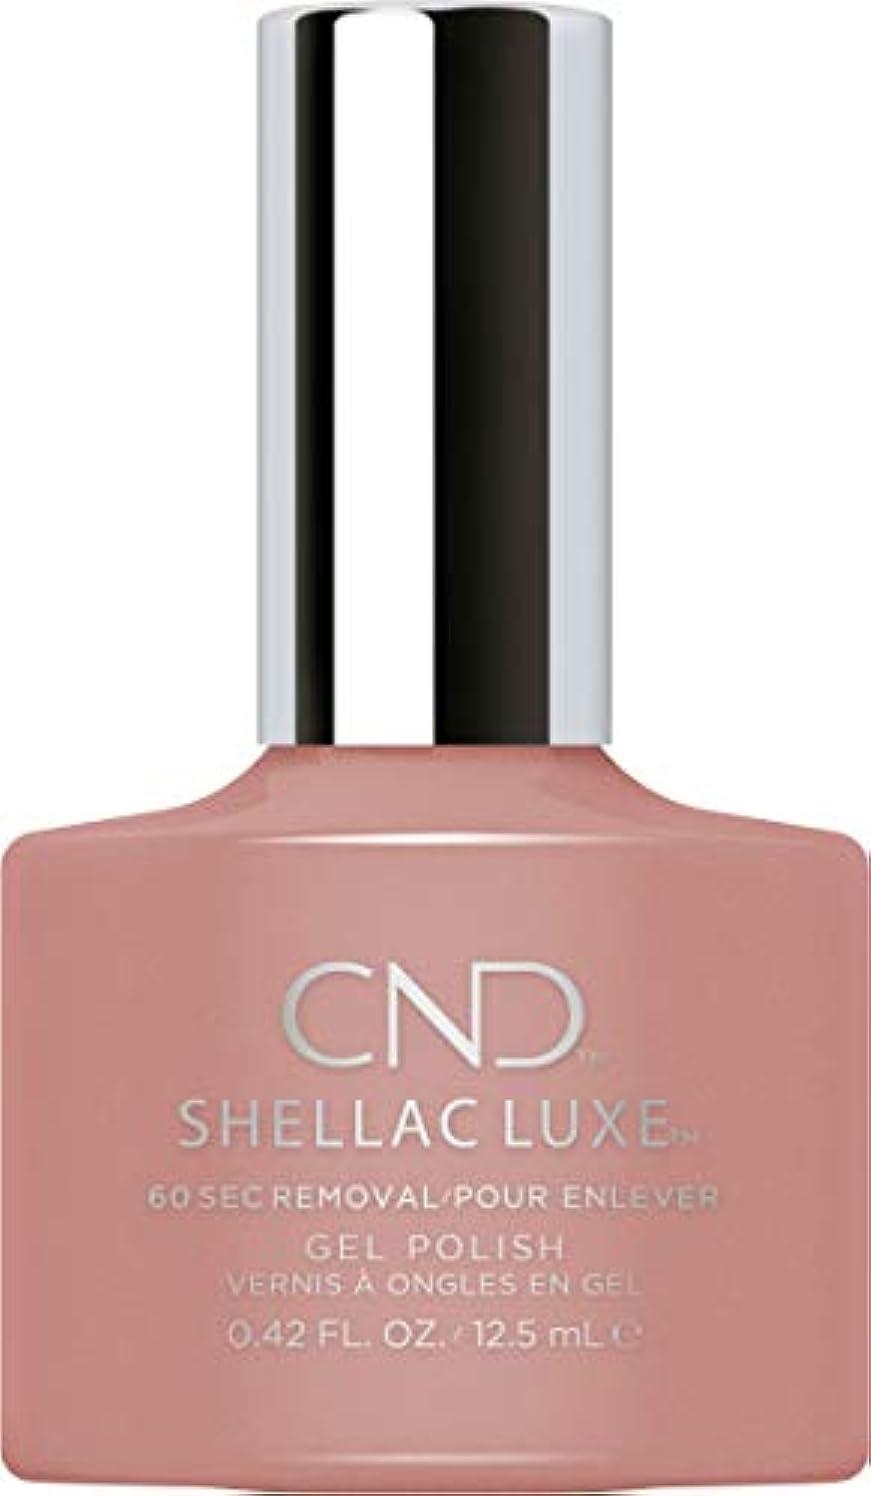 CND Shellac Luxe - Satin Pajamas - 12.5 ml / 0.42 oz